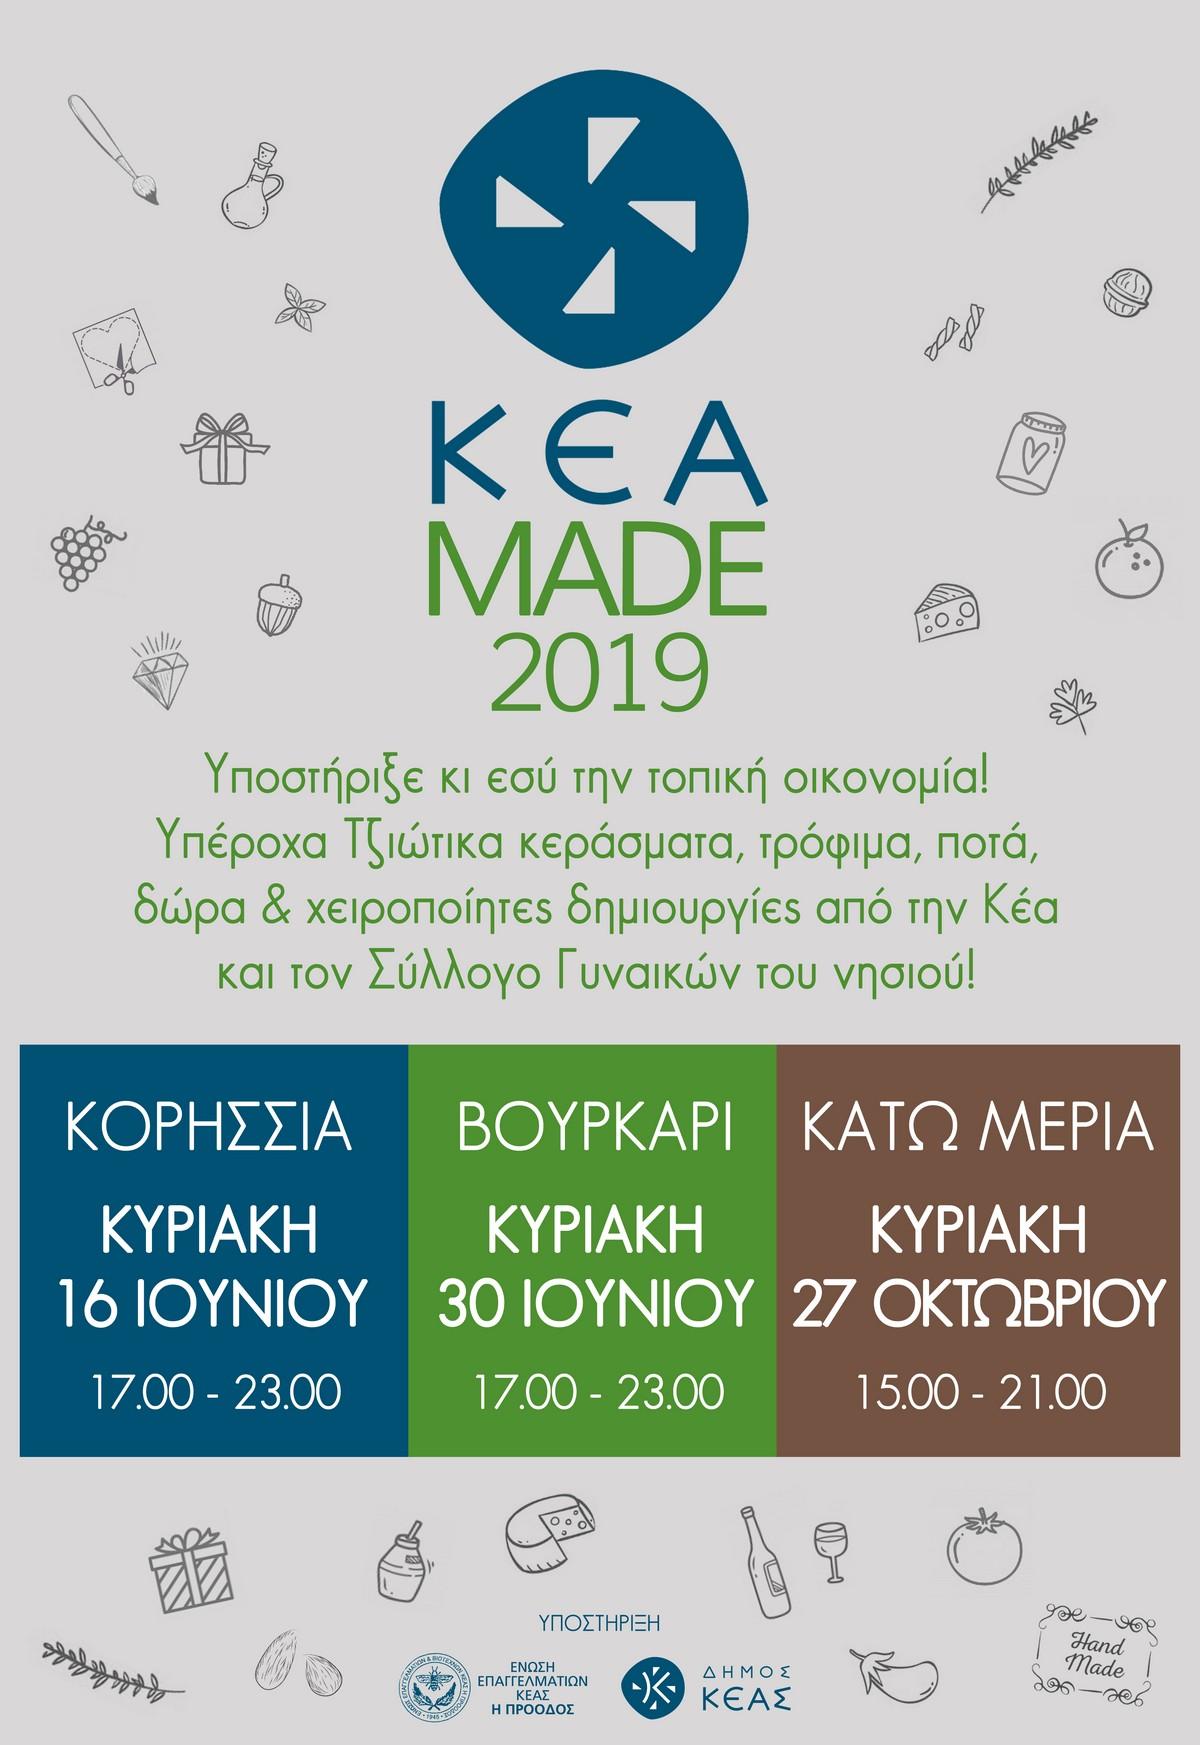 KEA MADE 2019